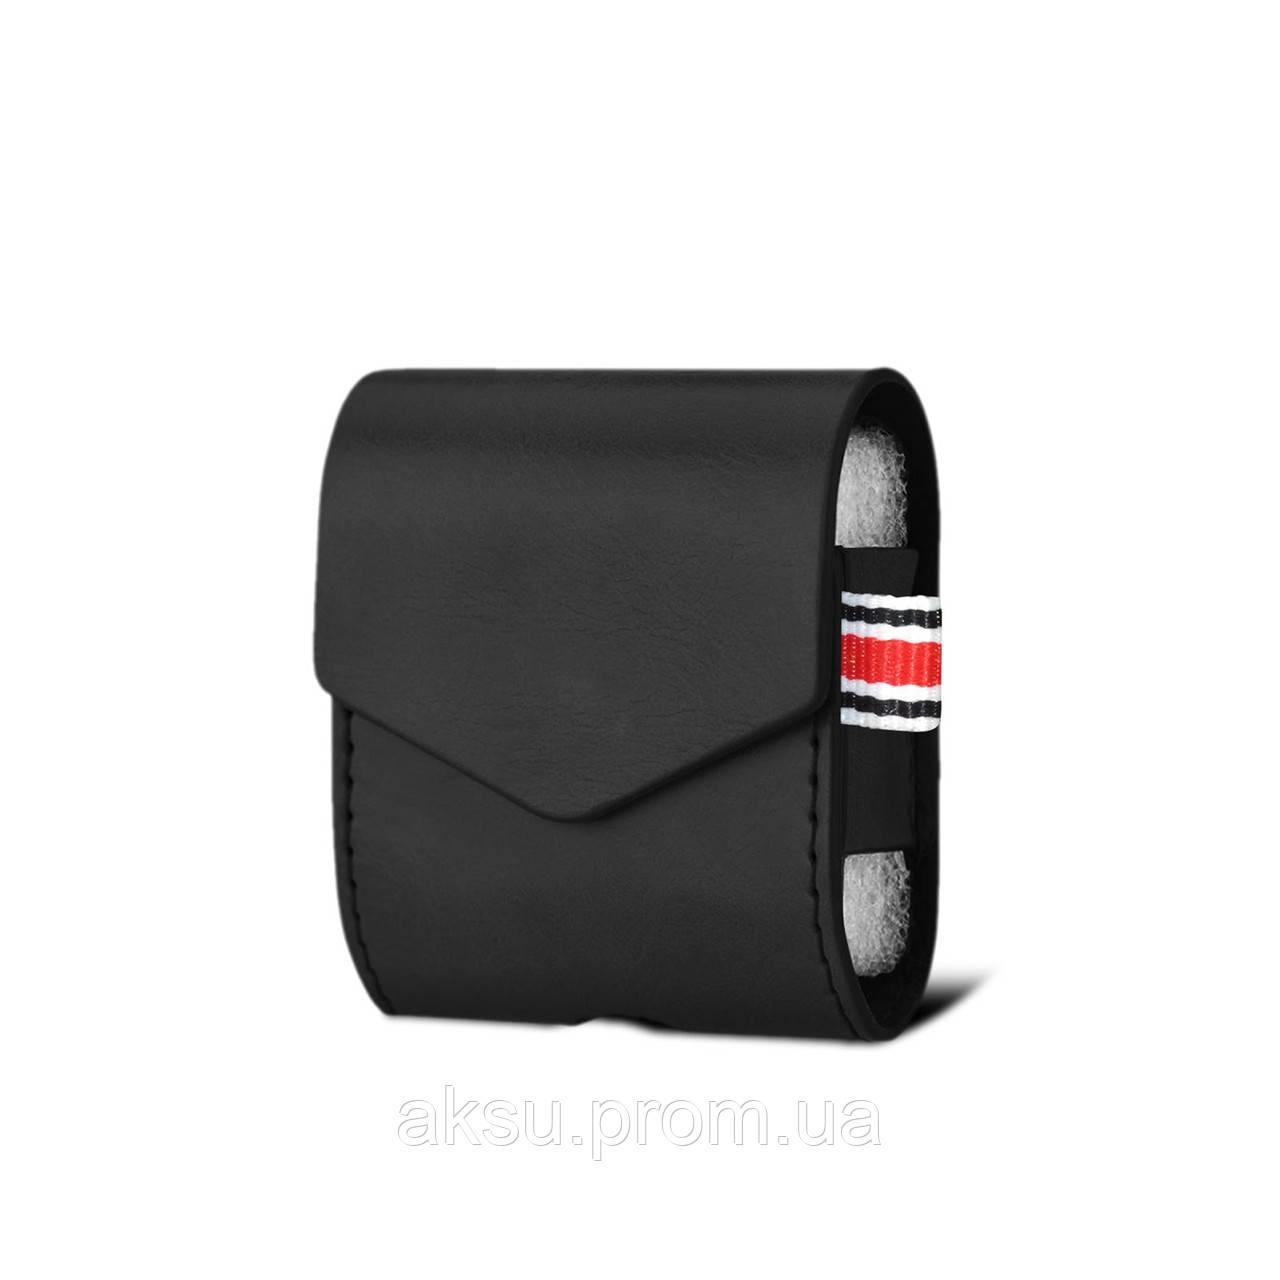 Чехол для AirPods Leather Case на наушники AirPods (Black)